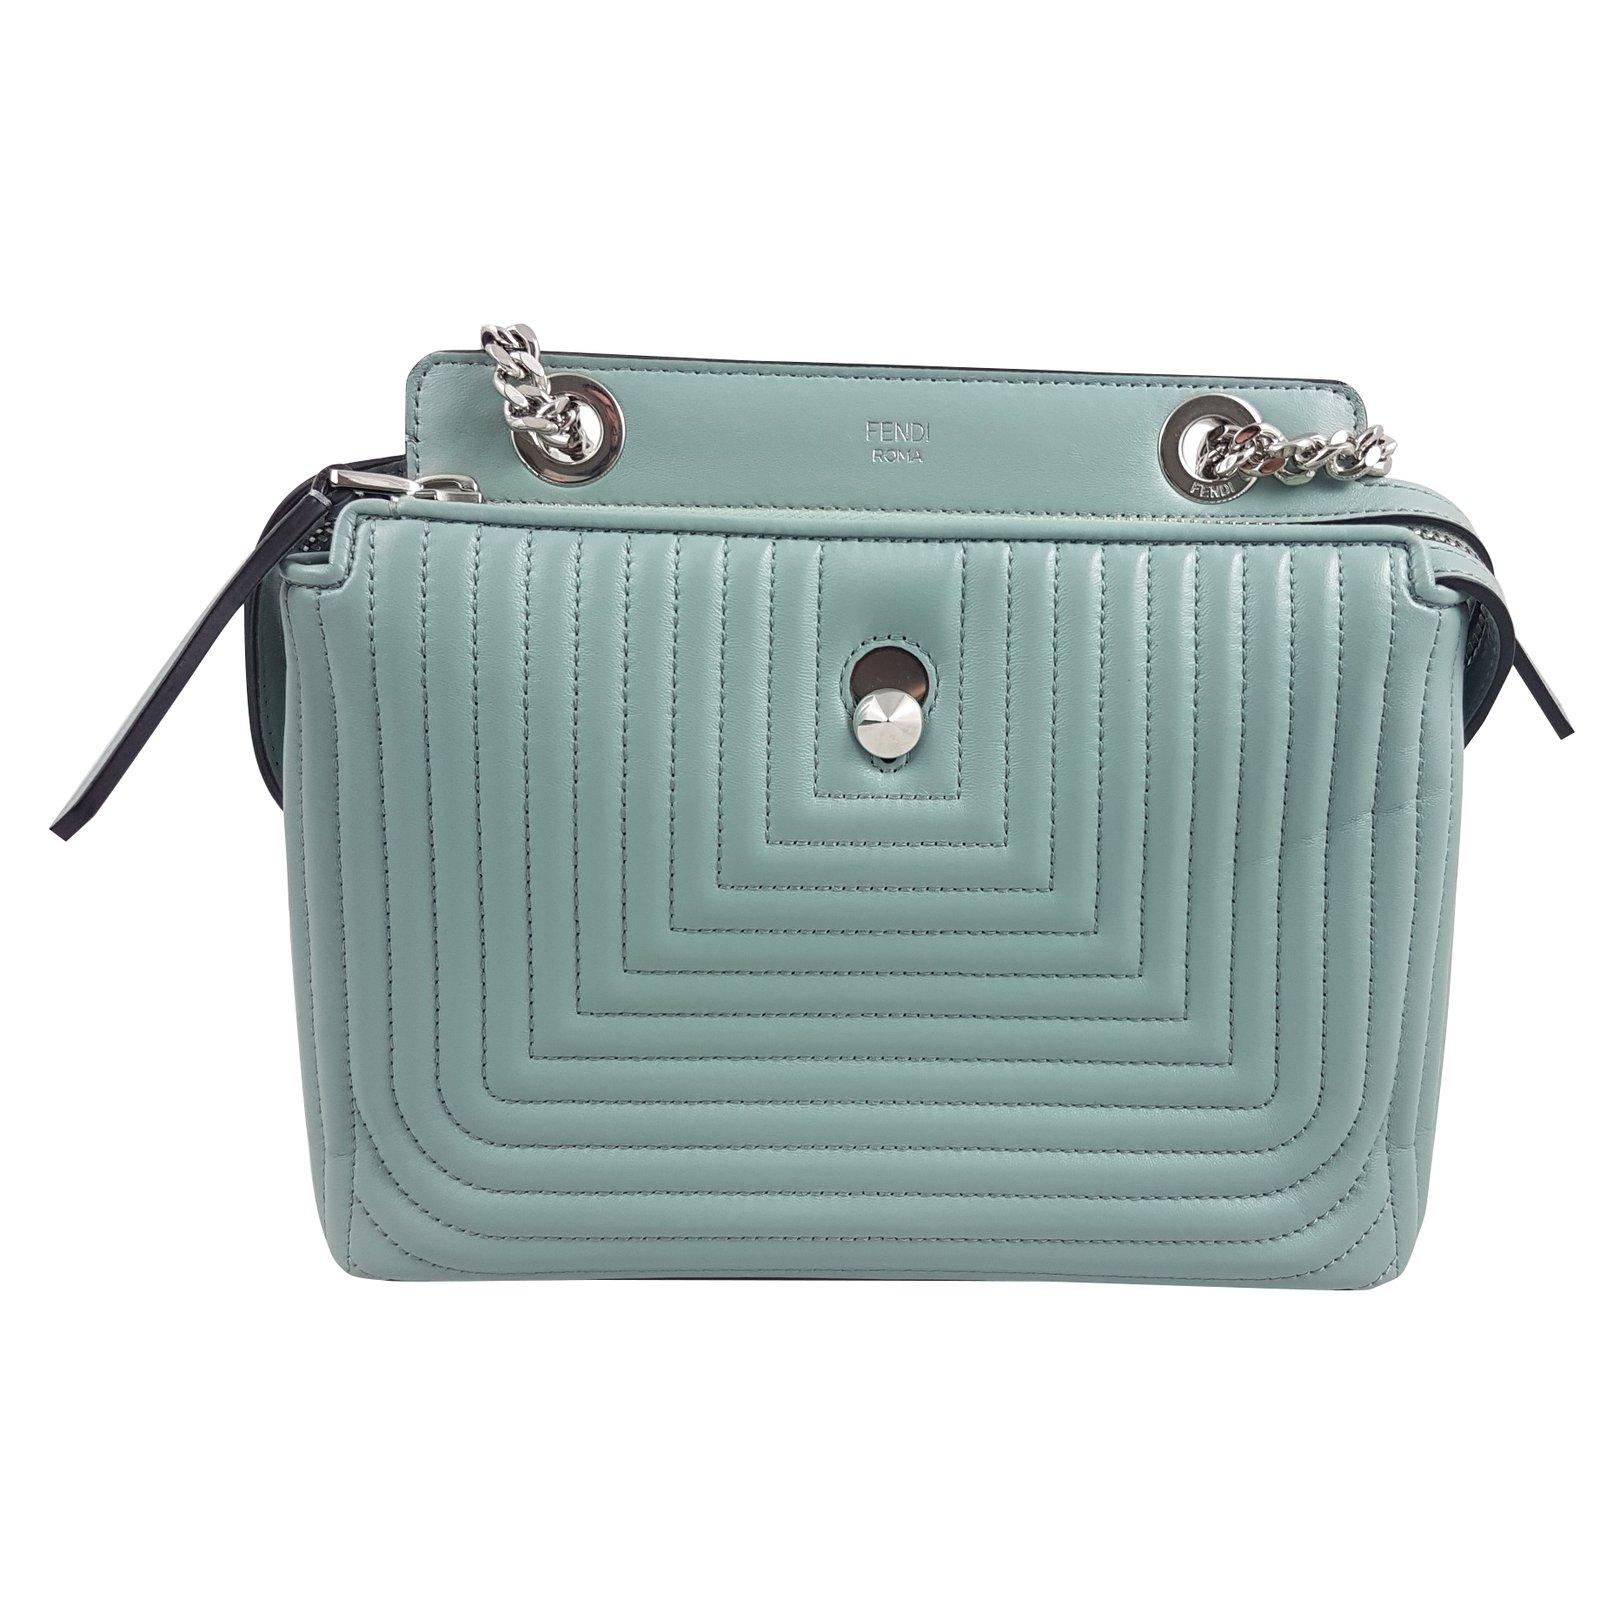 0fff0ef1000d ... sale fendi blue pale dotcom quilted leather small shoulder bag handbags  leather blue ref.59432